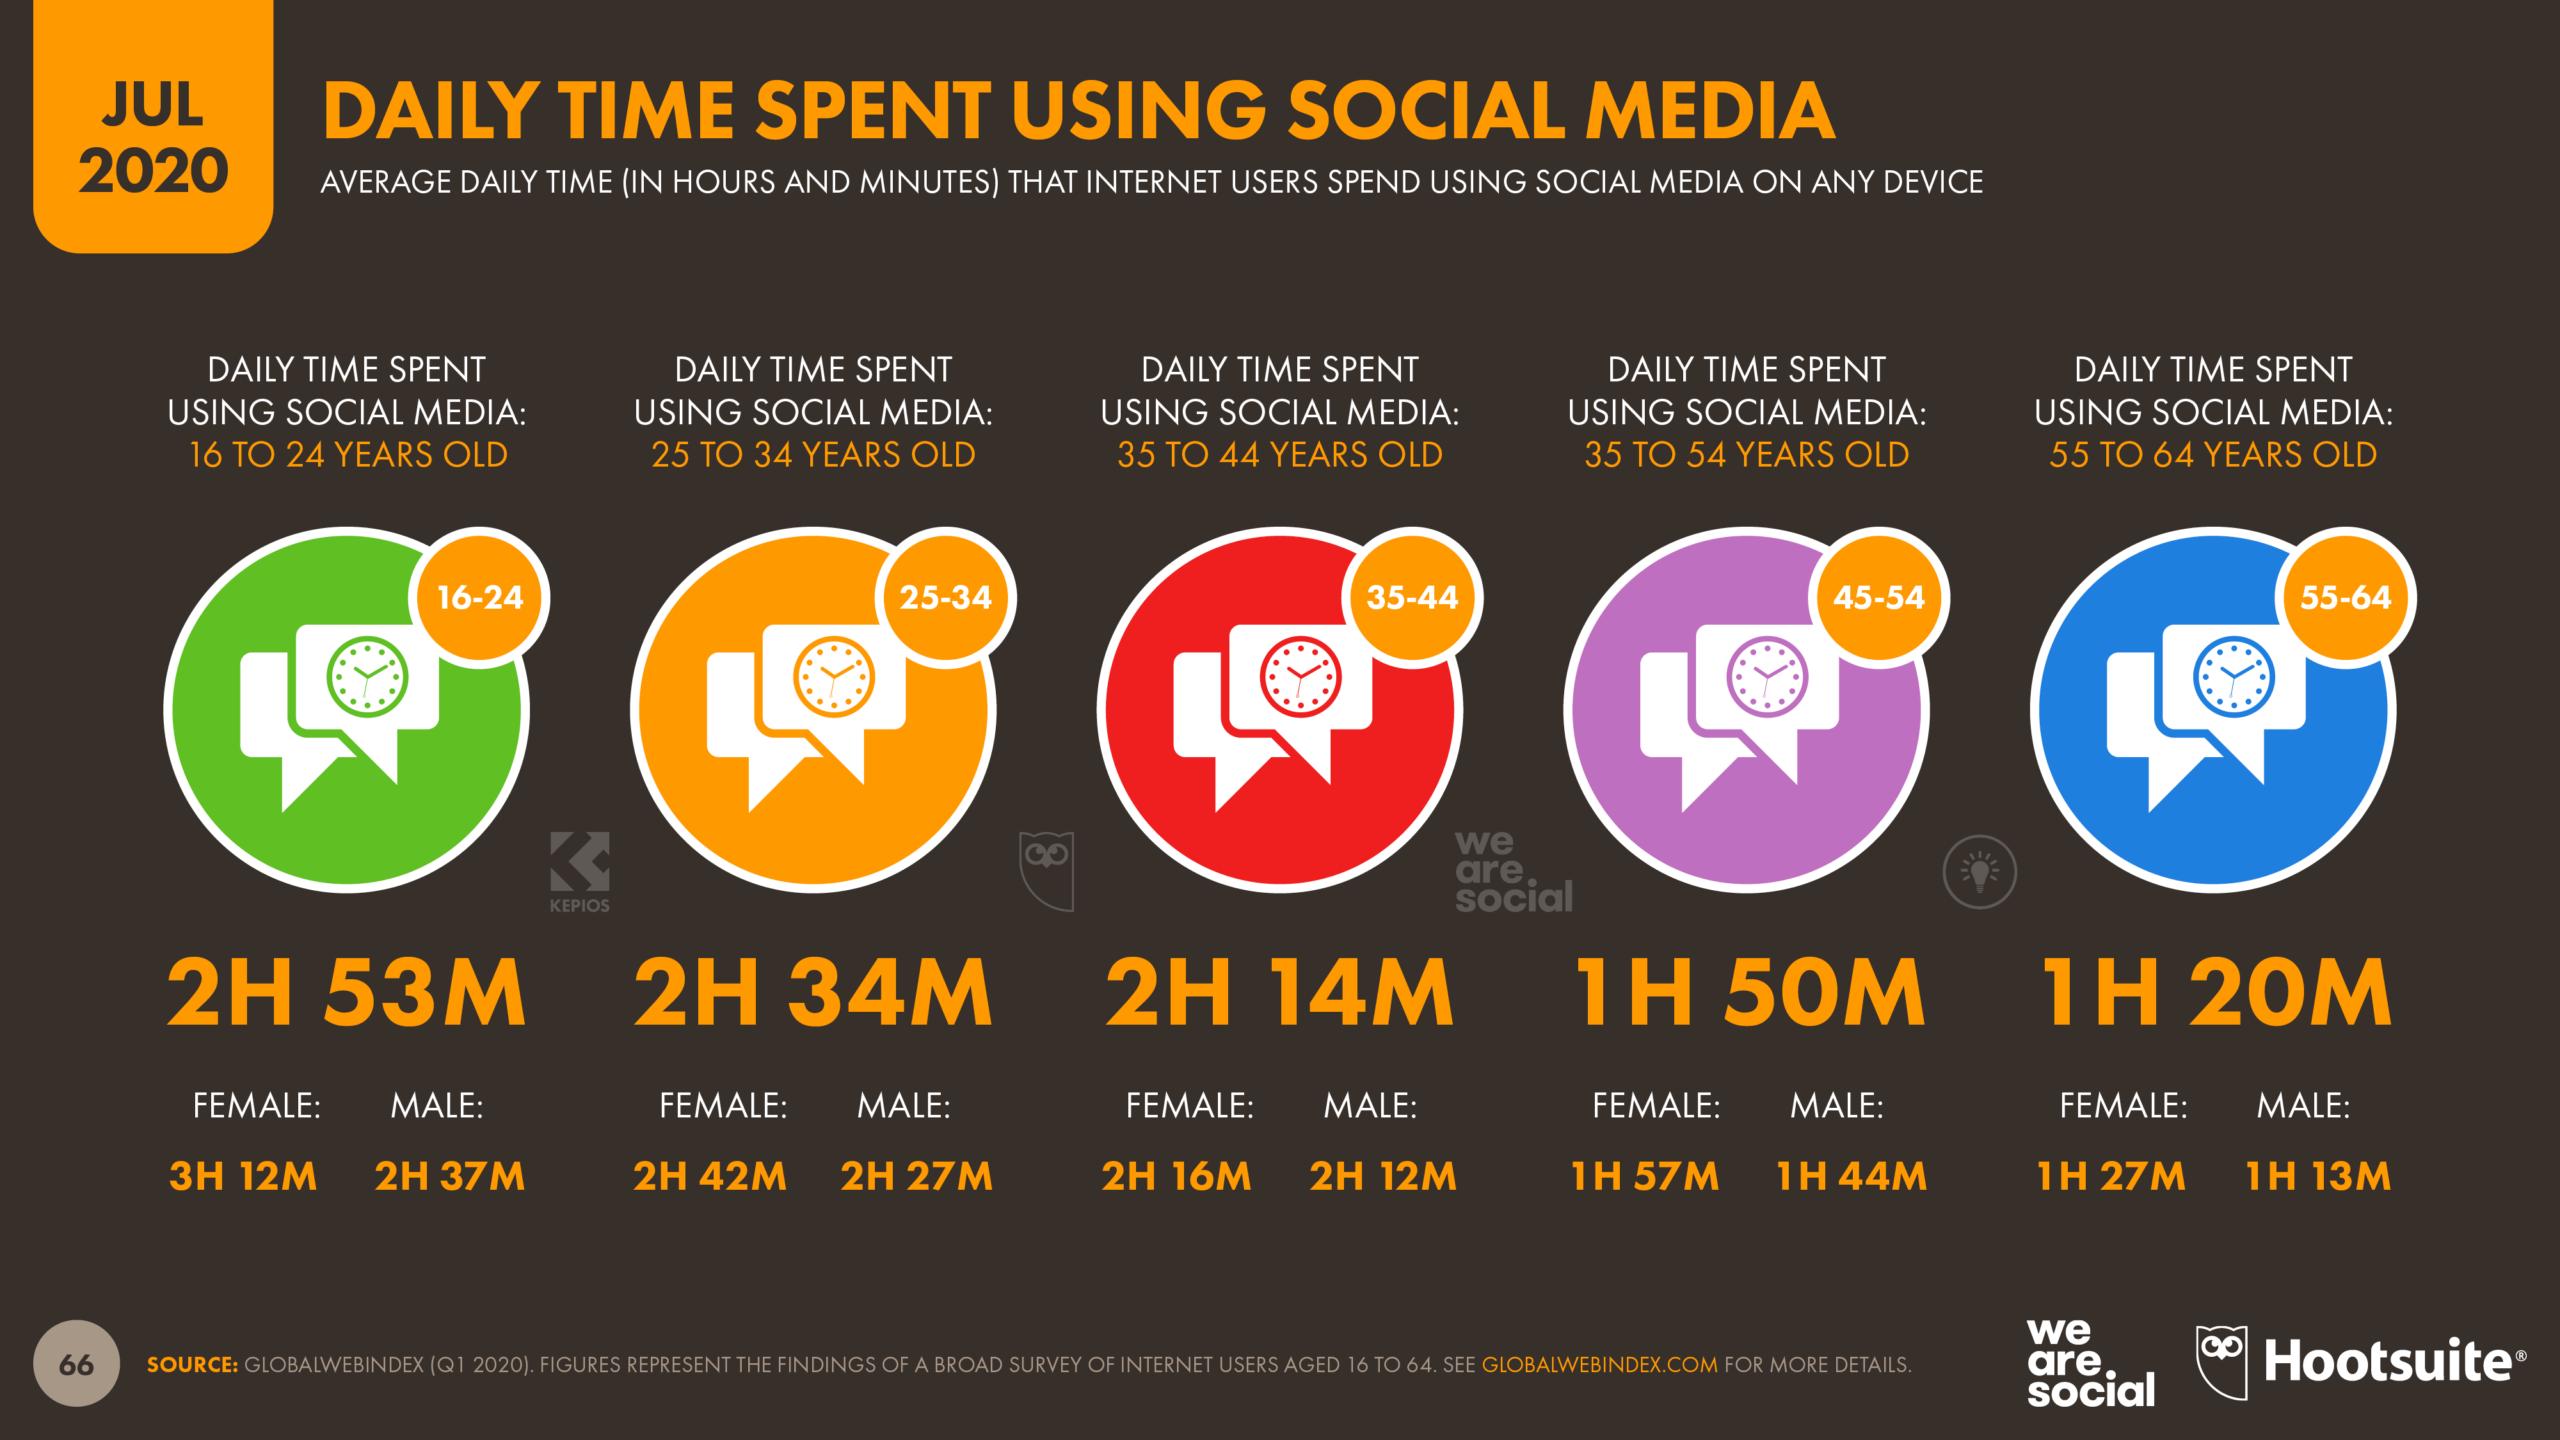 Daily Time Spent on Social Media